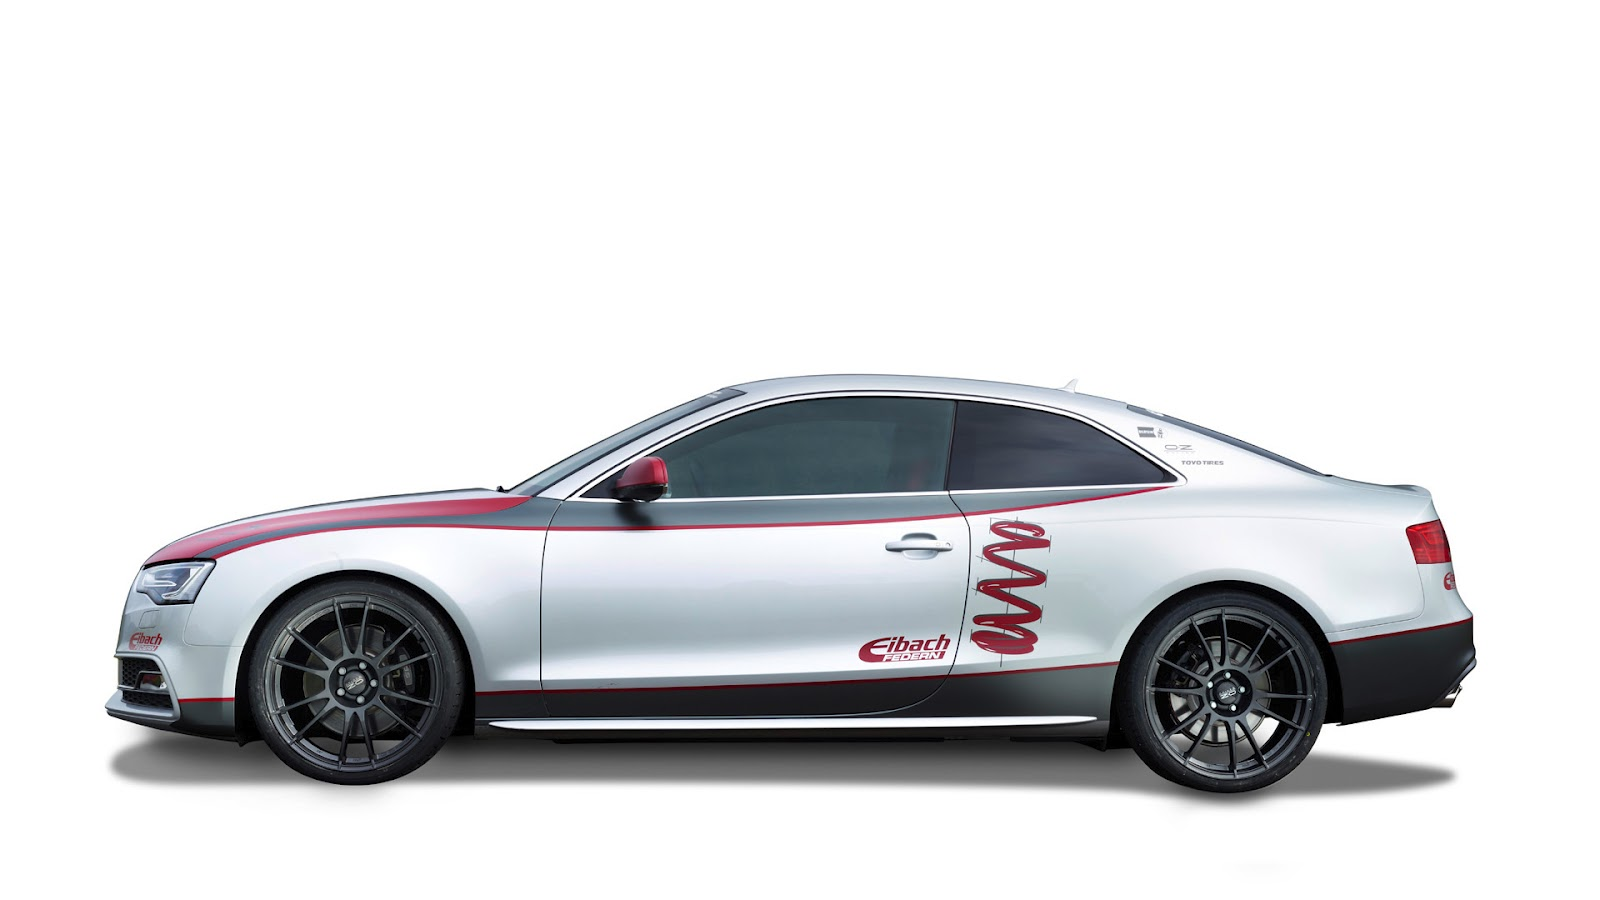 2012 Eibach Audi S5 Project Car 4 2 V8 364 Hp Carwp